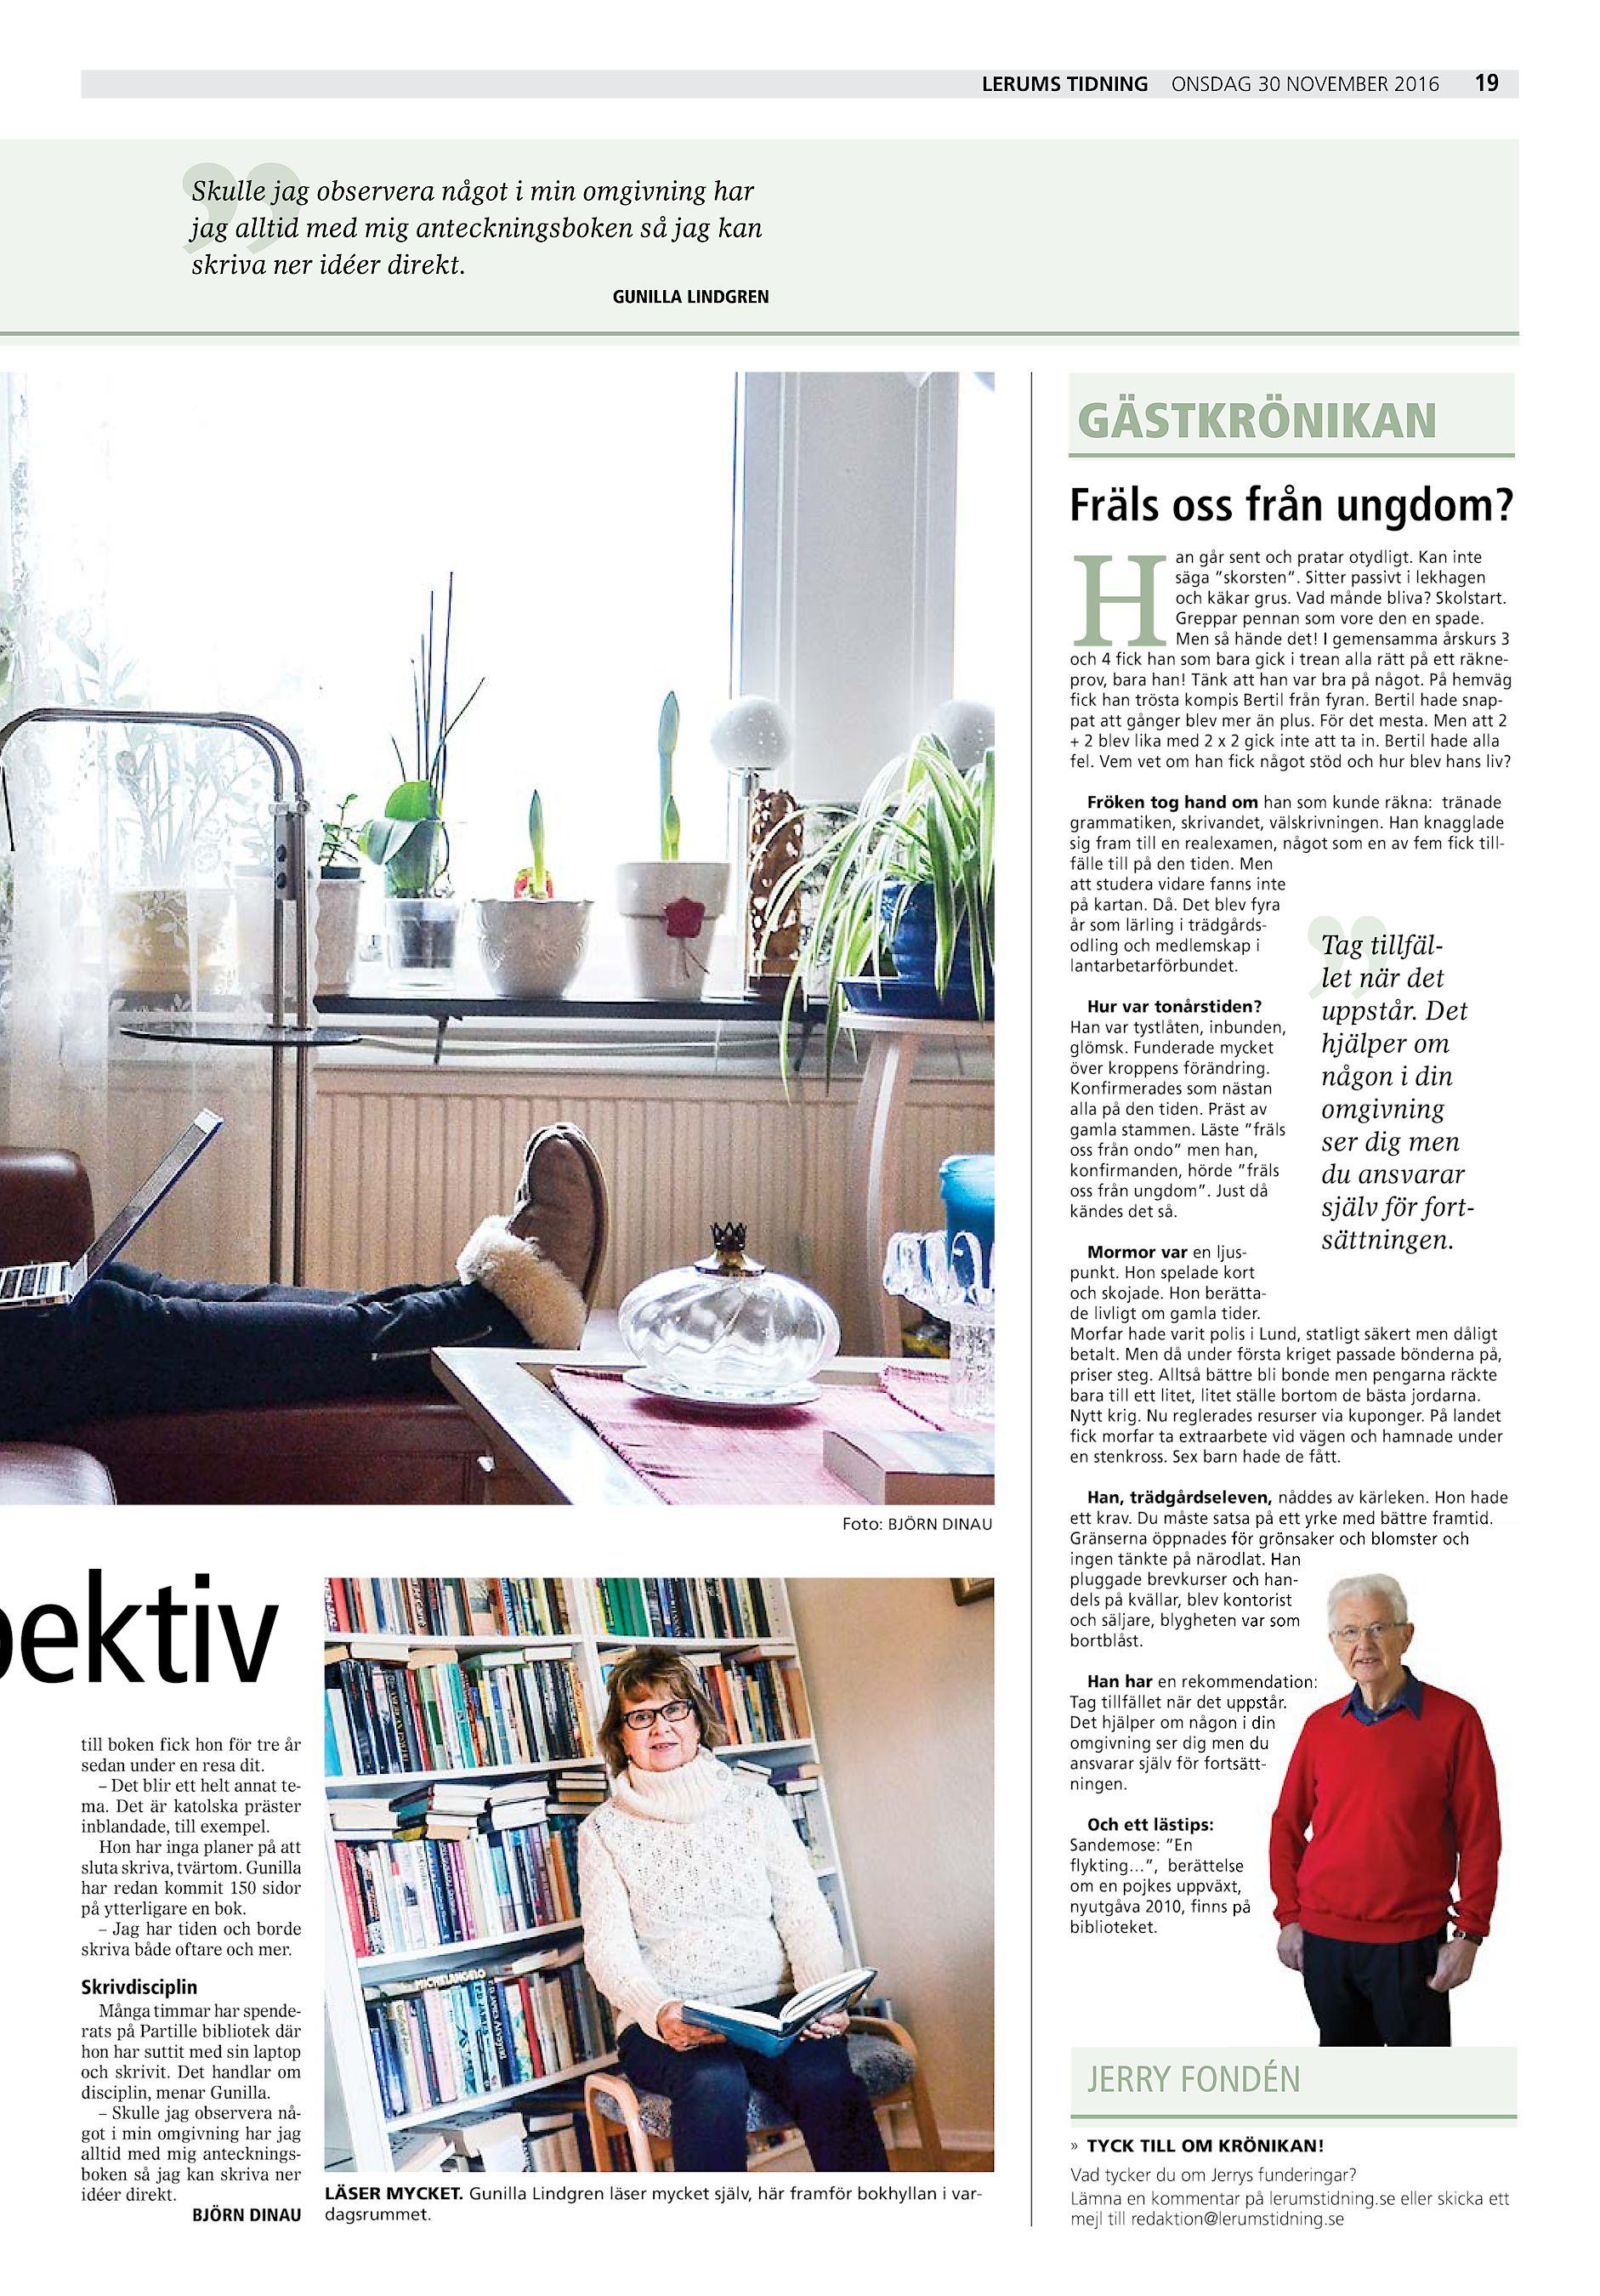 Lerums tidning lt 2016 11 30 (endast text)